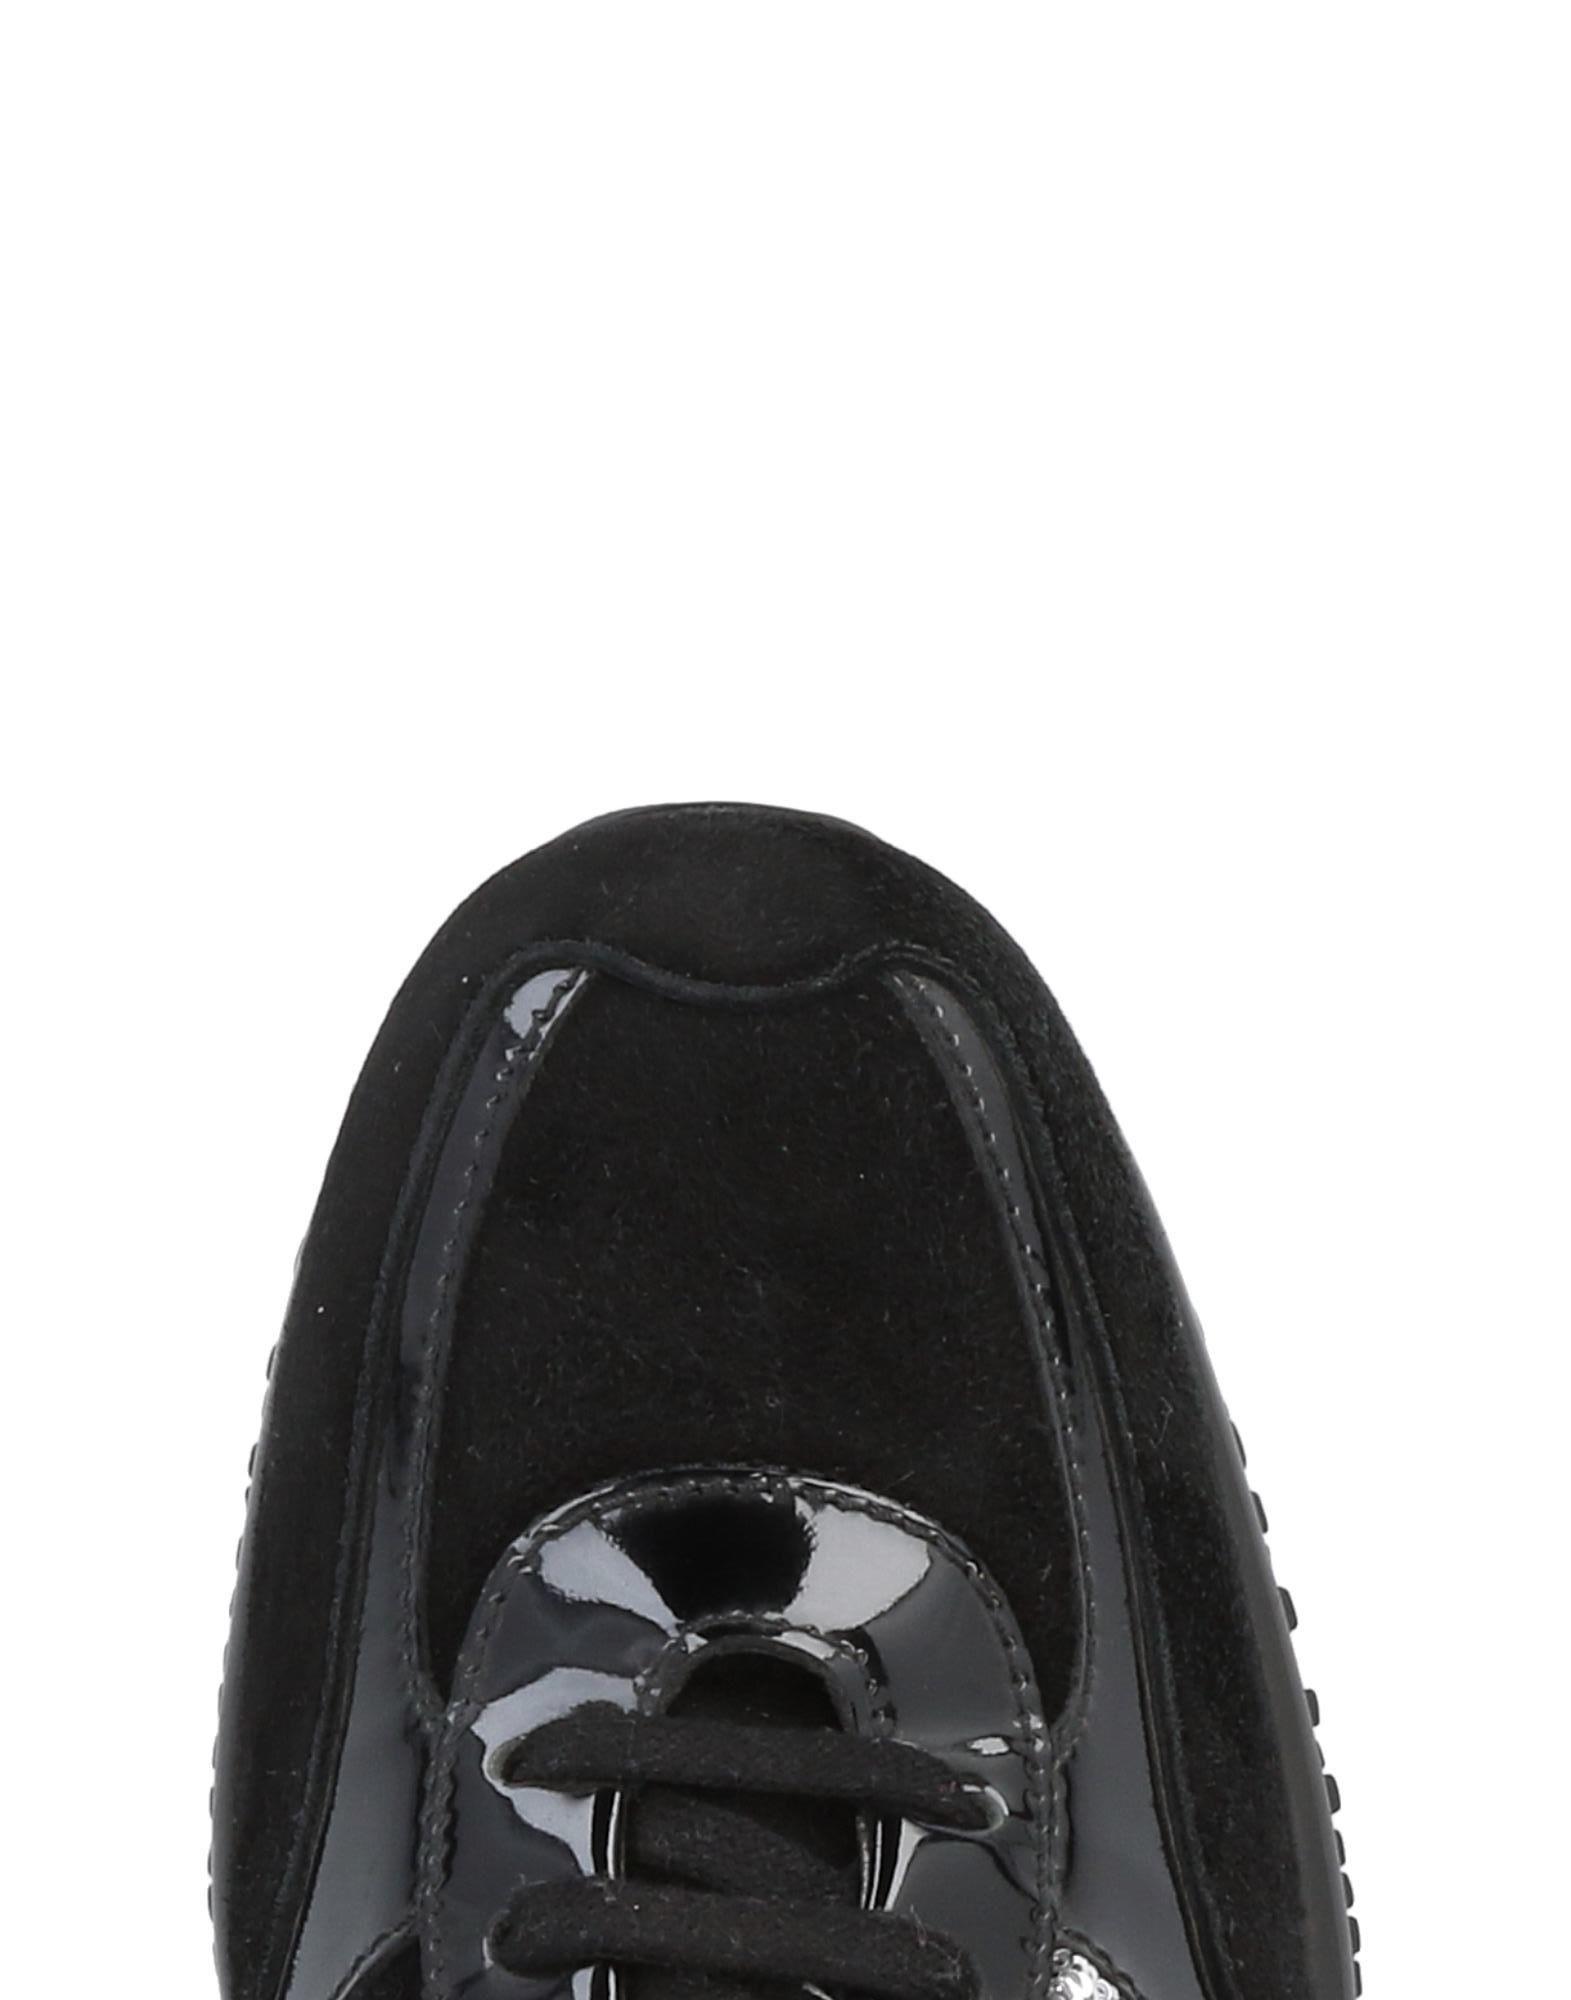 Hogan aussehende Sneakers Damen  11437196BHGut aussehende Hogan strapazierfähige Schuhe d07e87